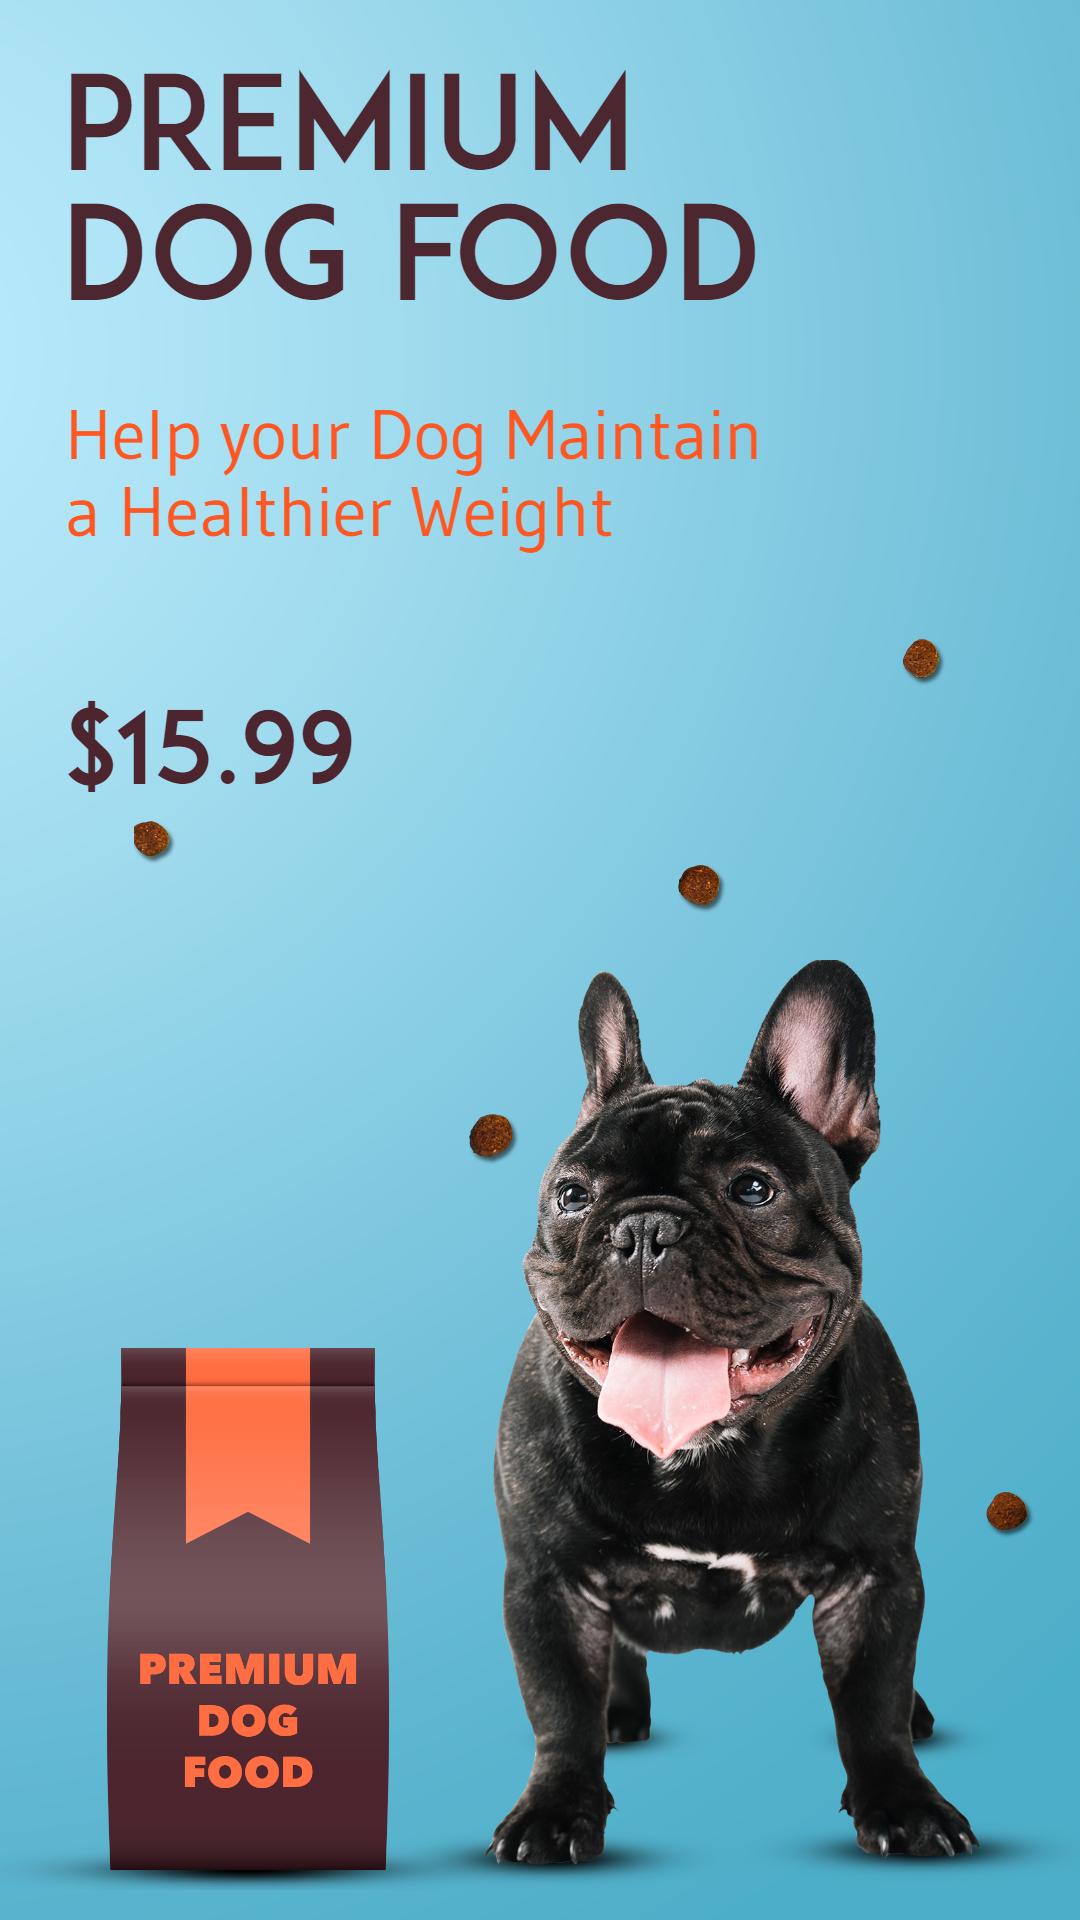 Dog Food Premium Pet Food Animation  Template